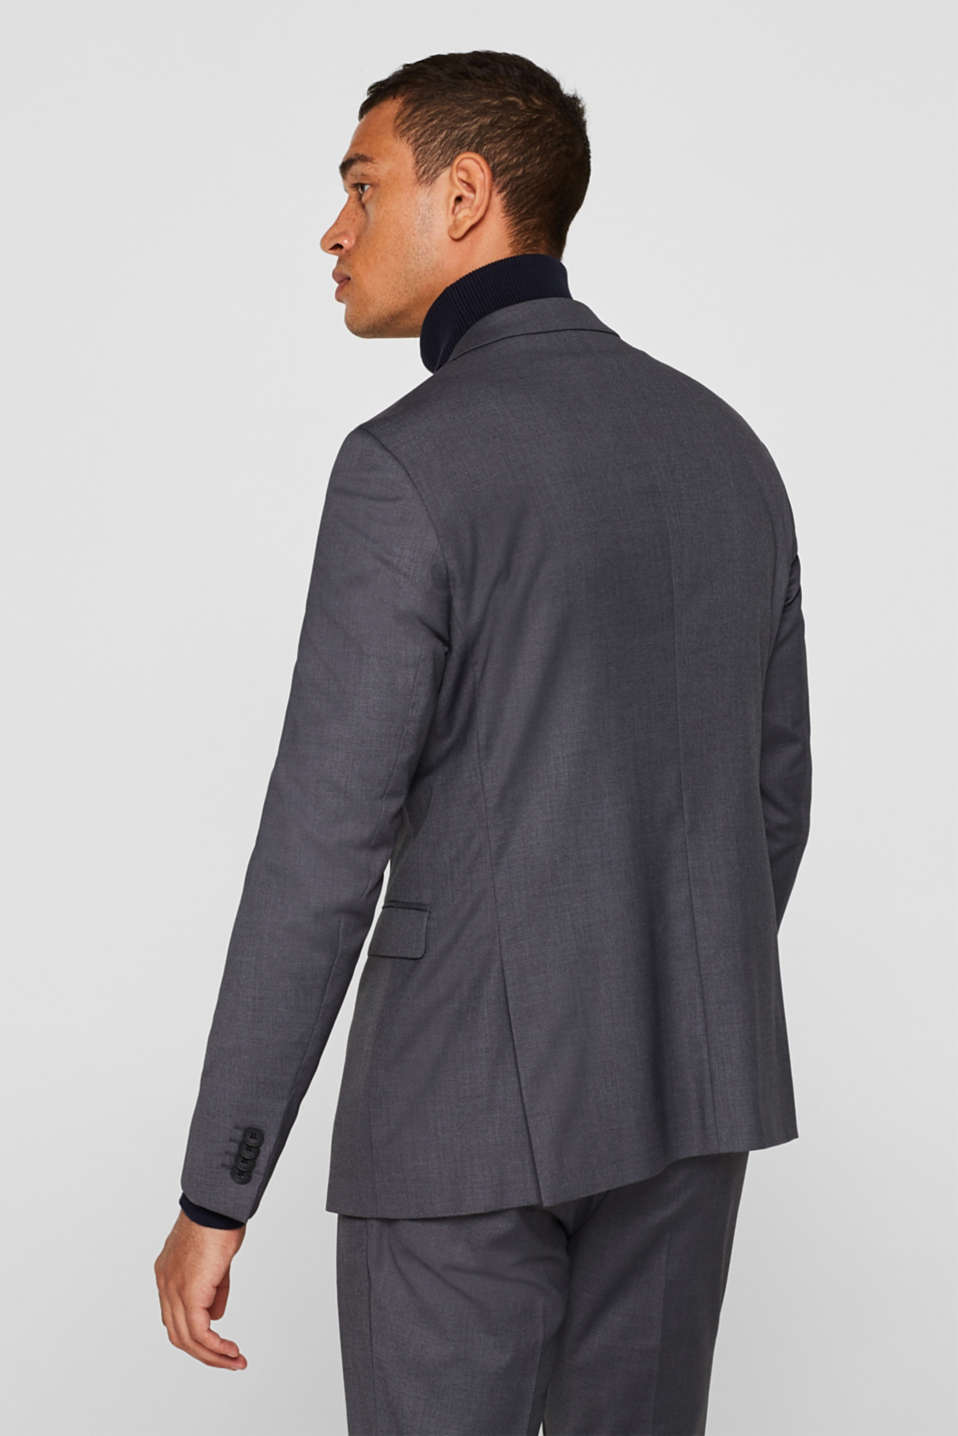 Blazers suit, GREY, detail image number 3